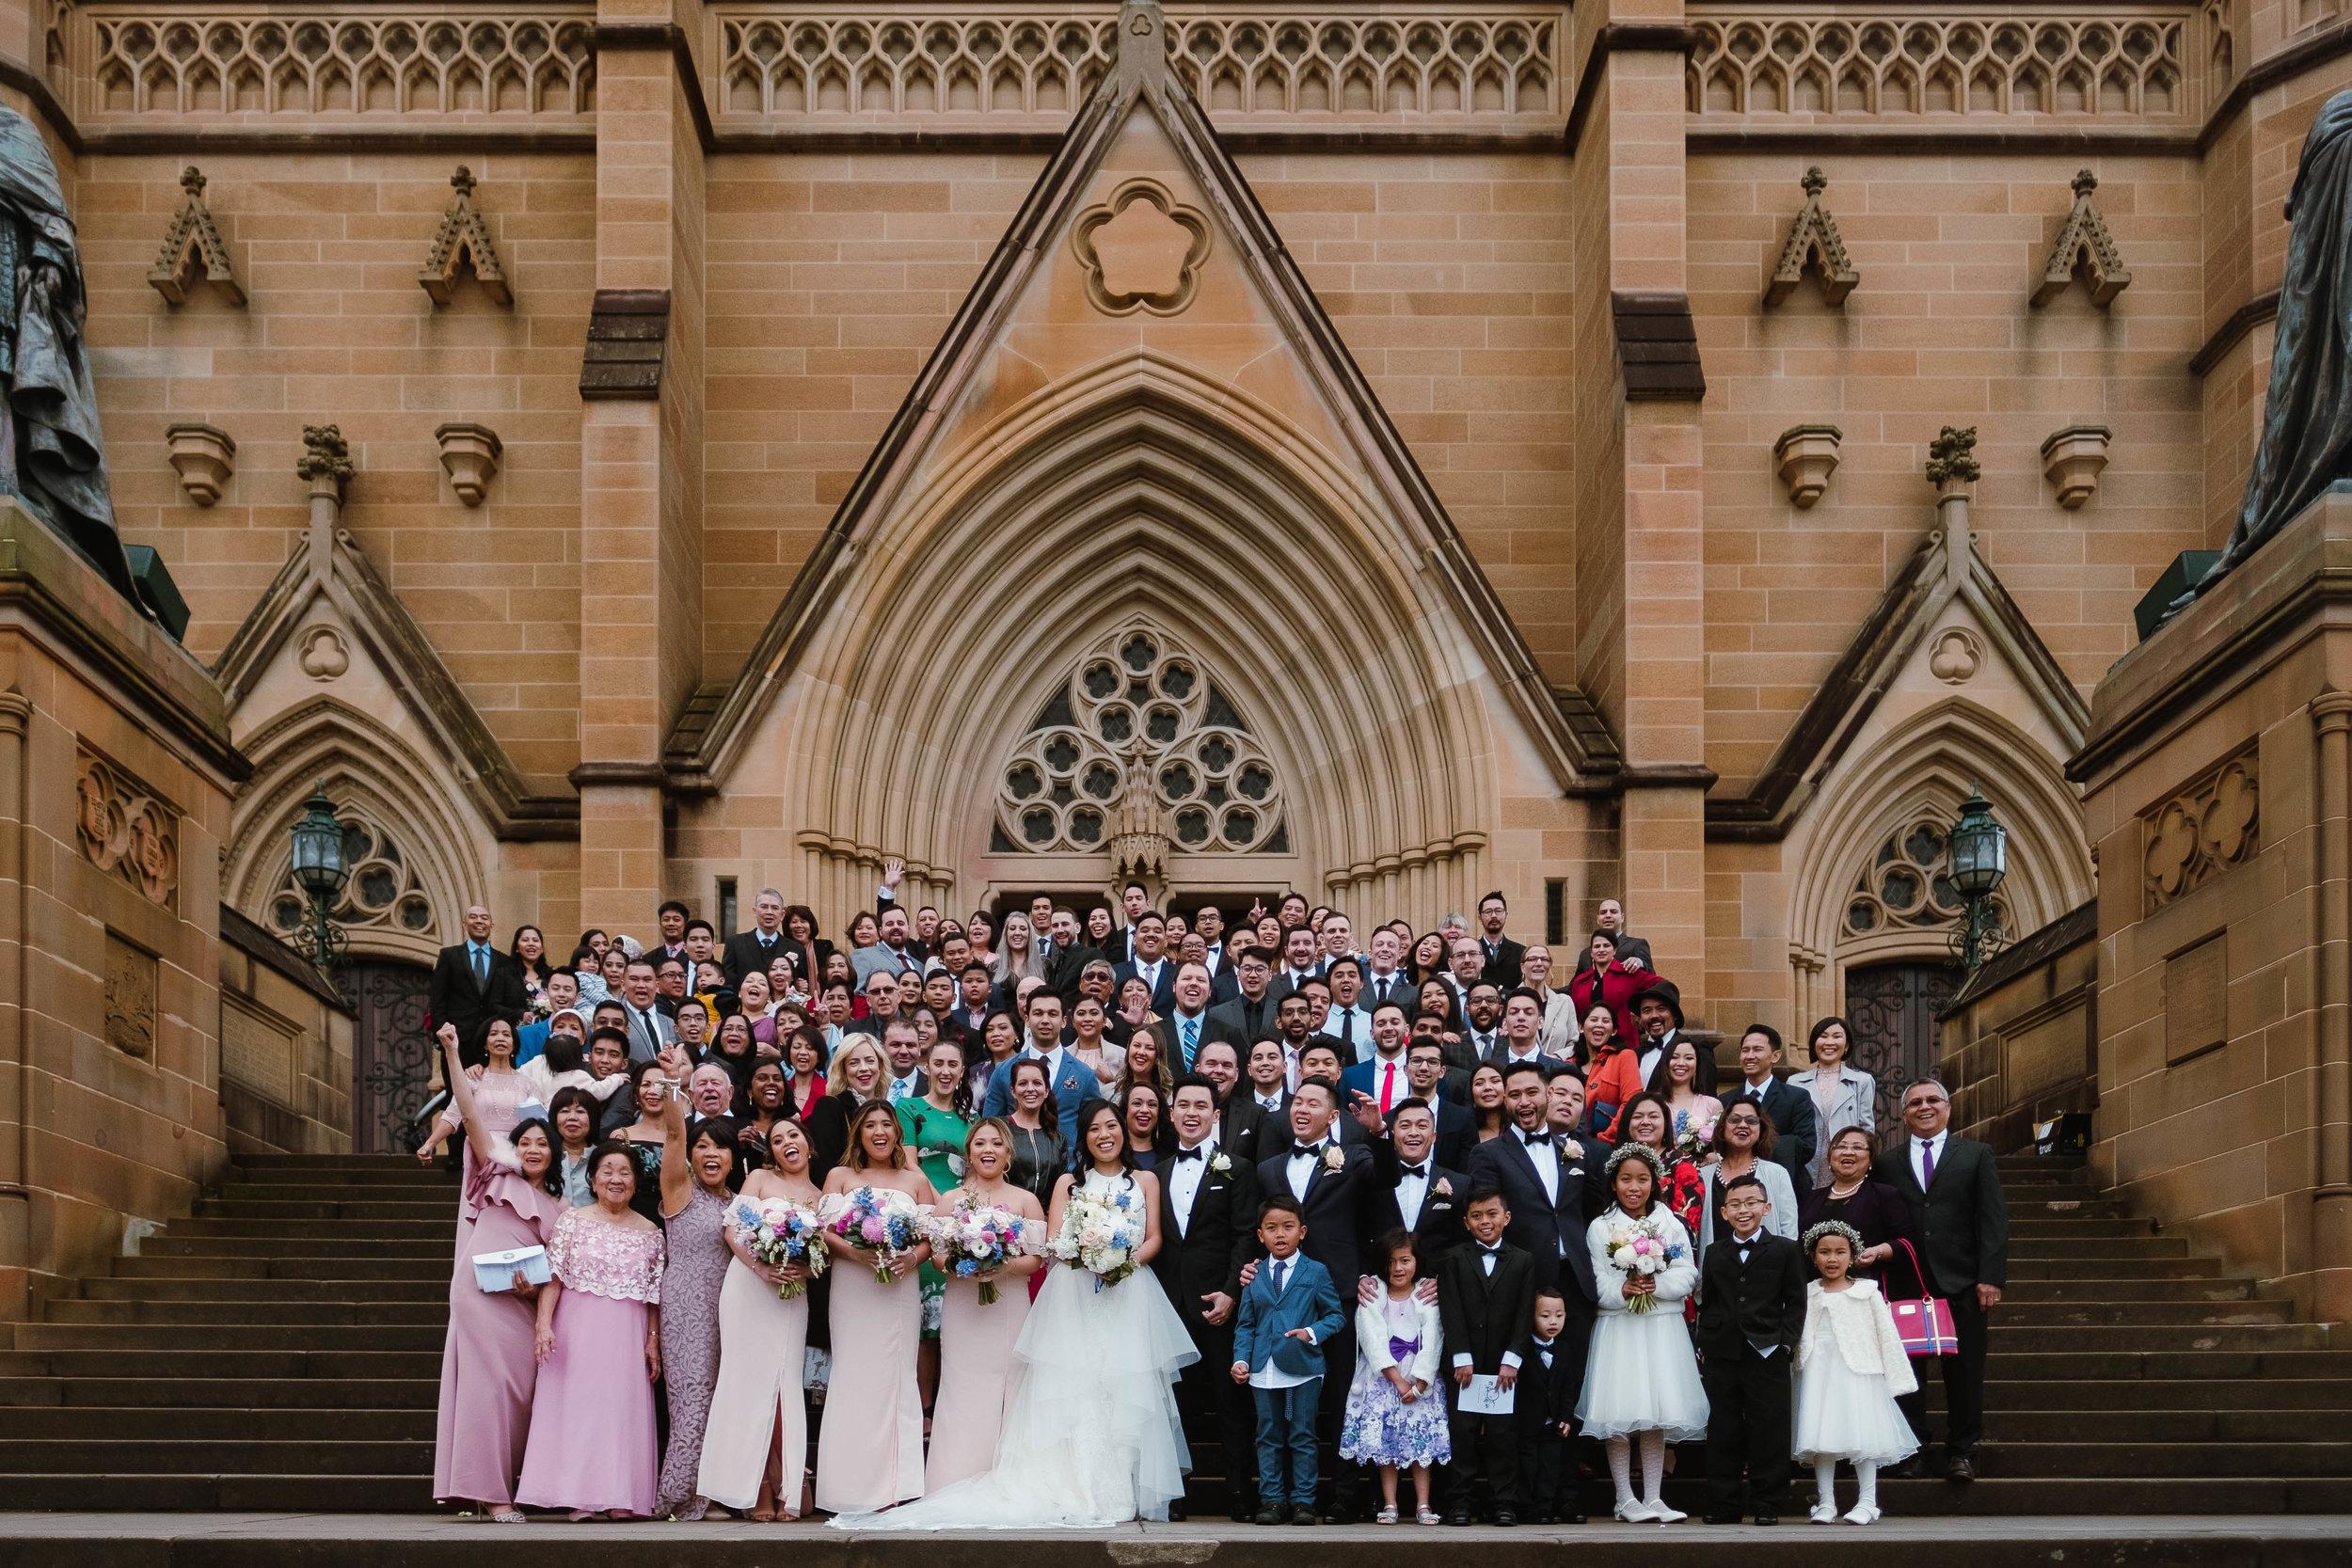 Maria and Gerald Sydney wedding by Milton Gan Photography 26.jpg